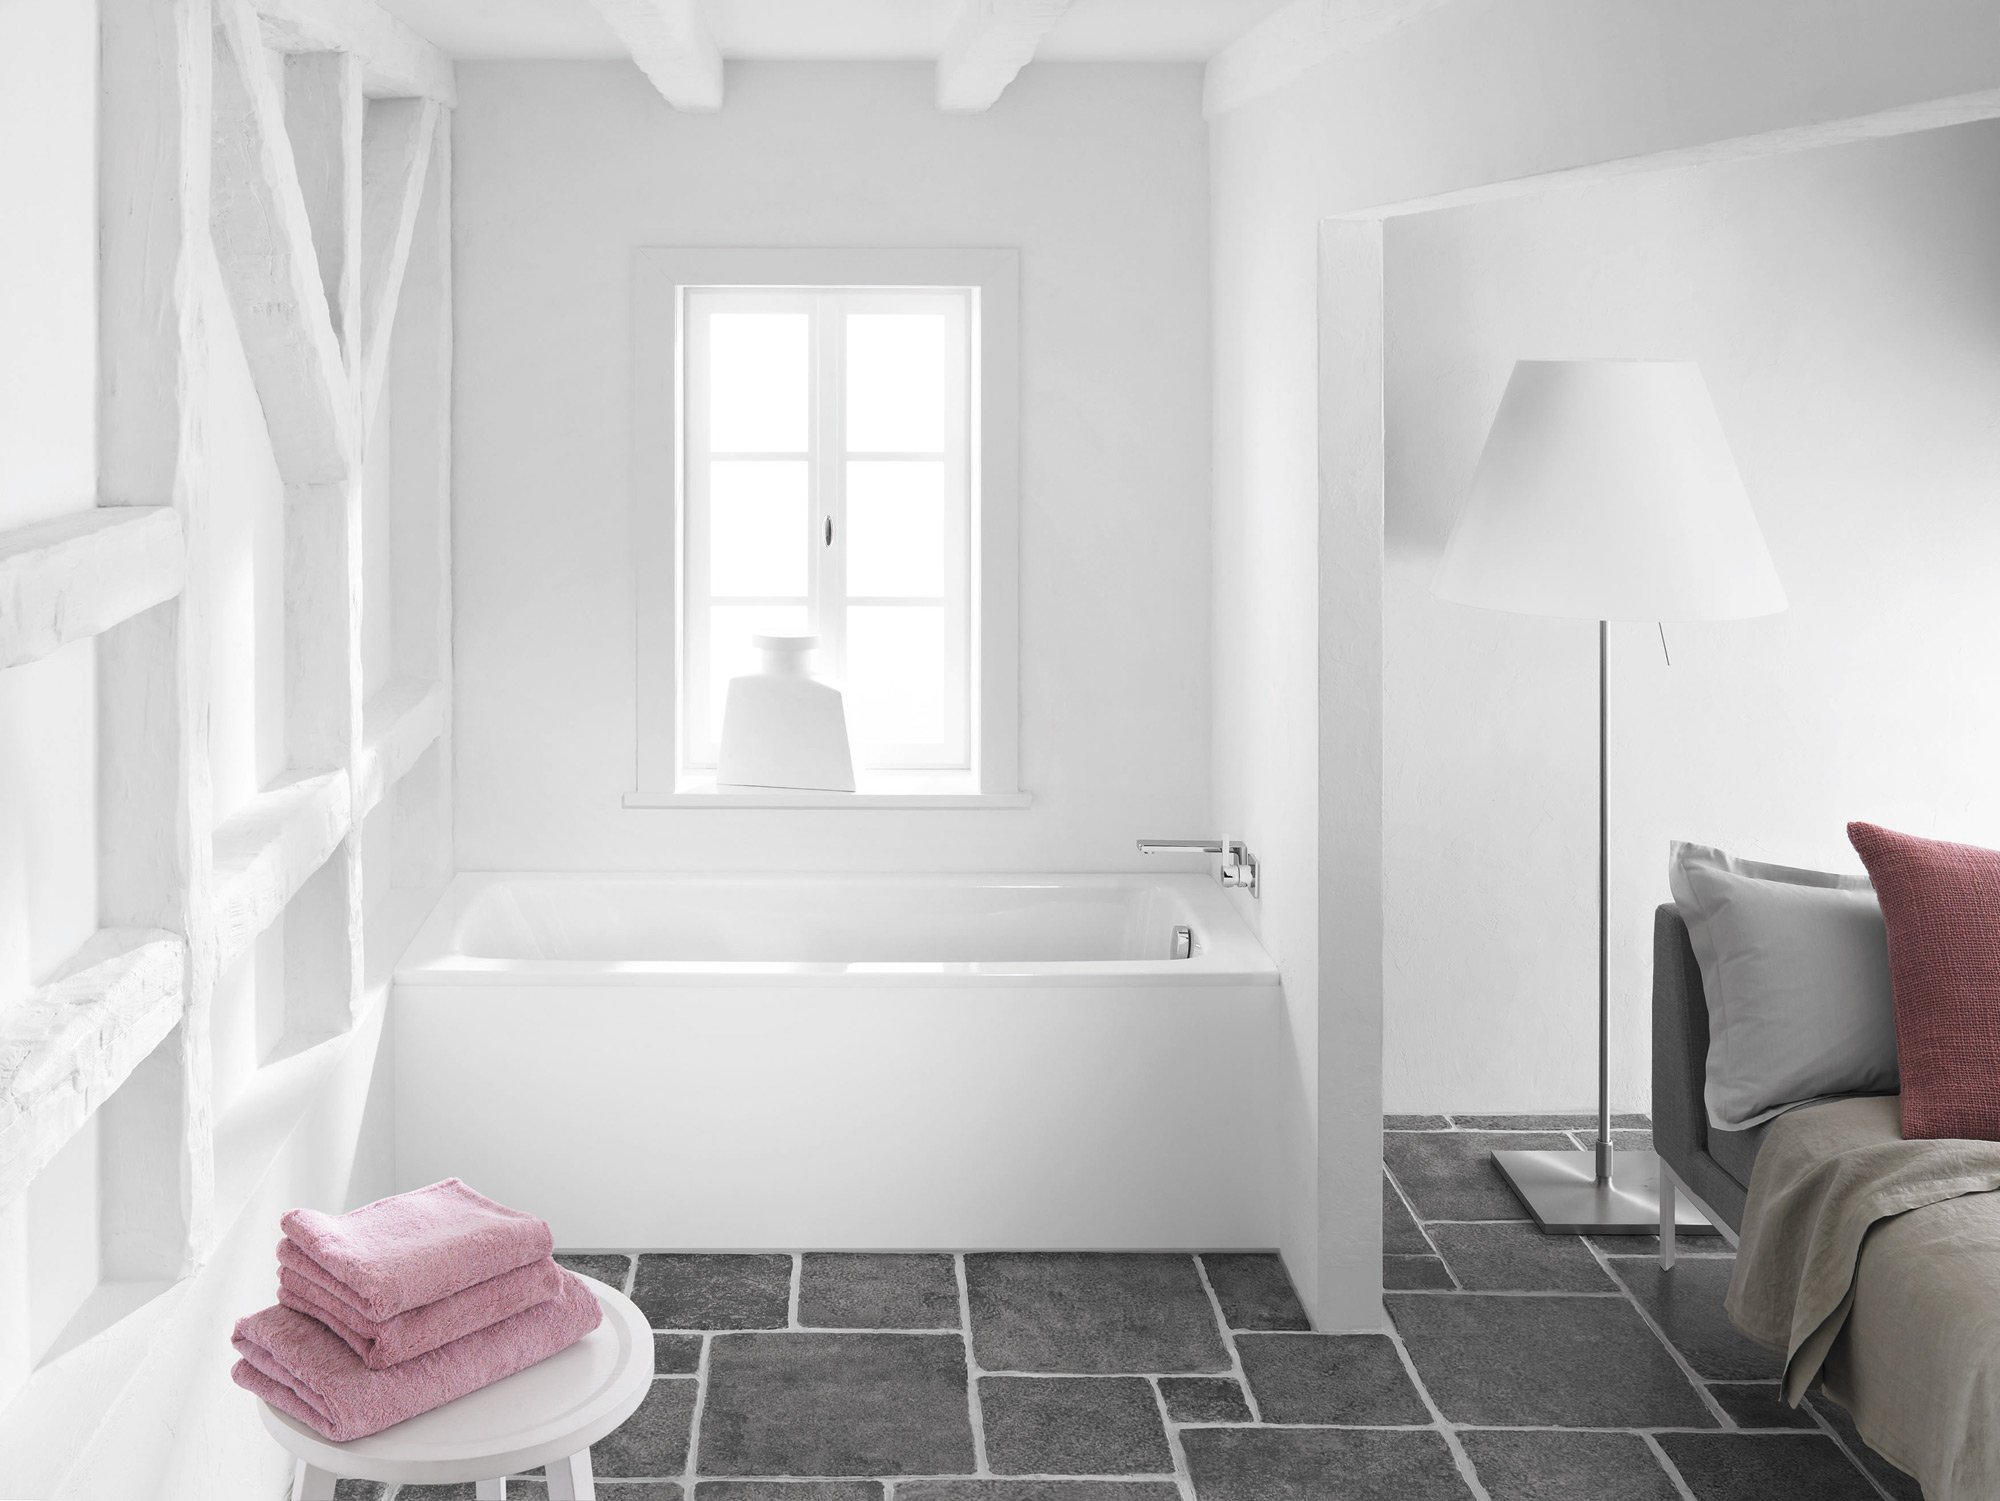 Vasca Da Bagno Kaldewei : Vasche da bagno piccole foto living corriere